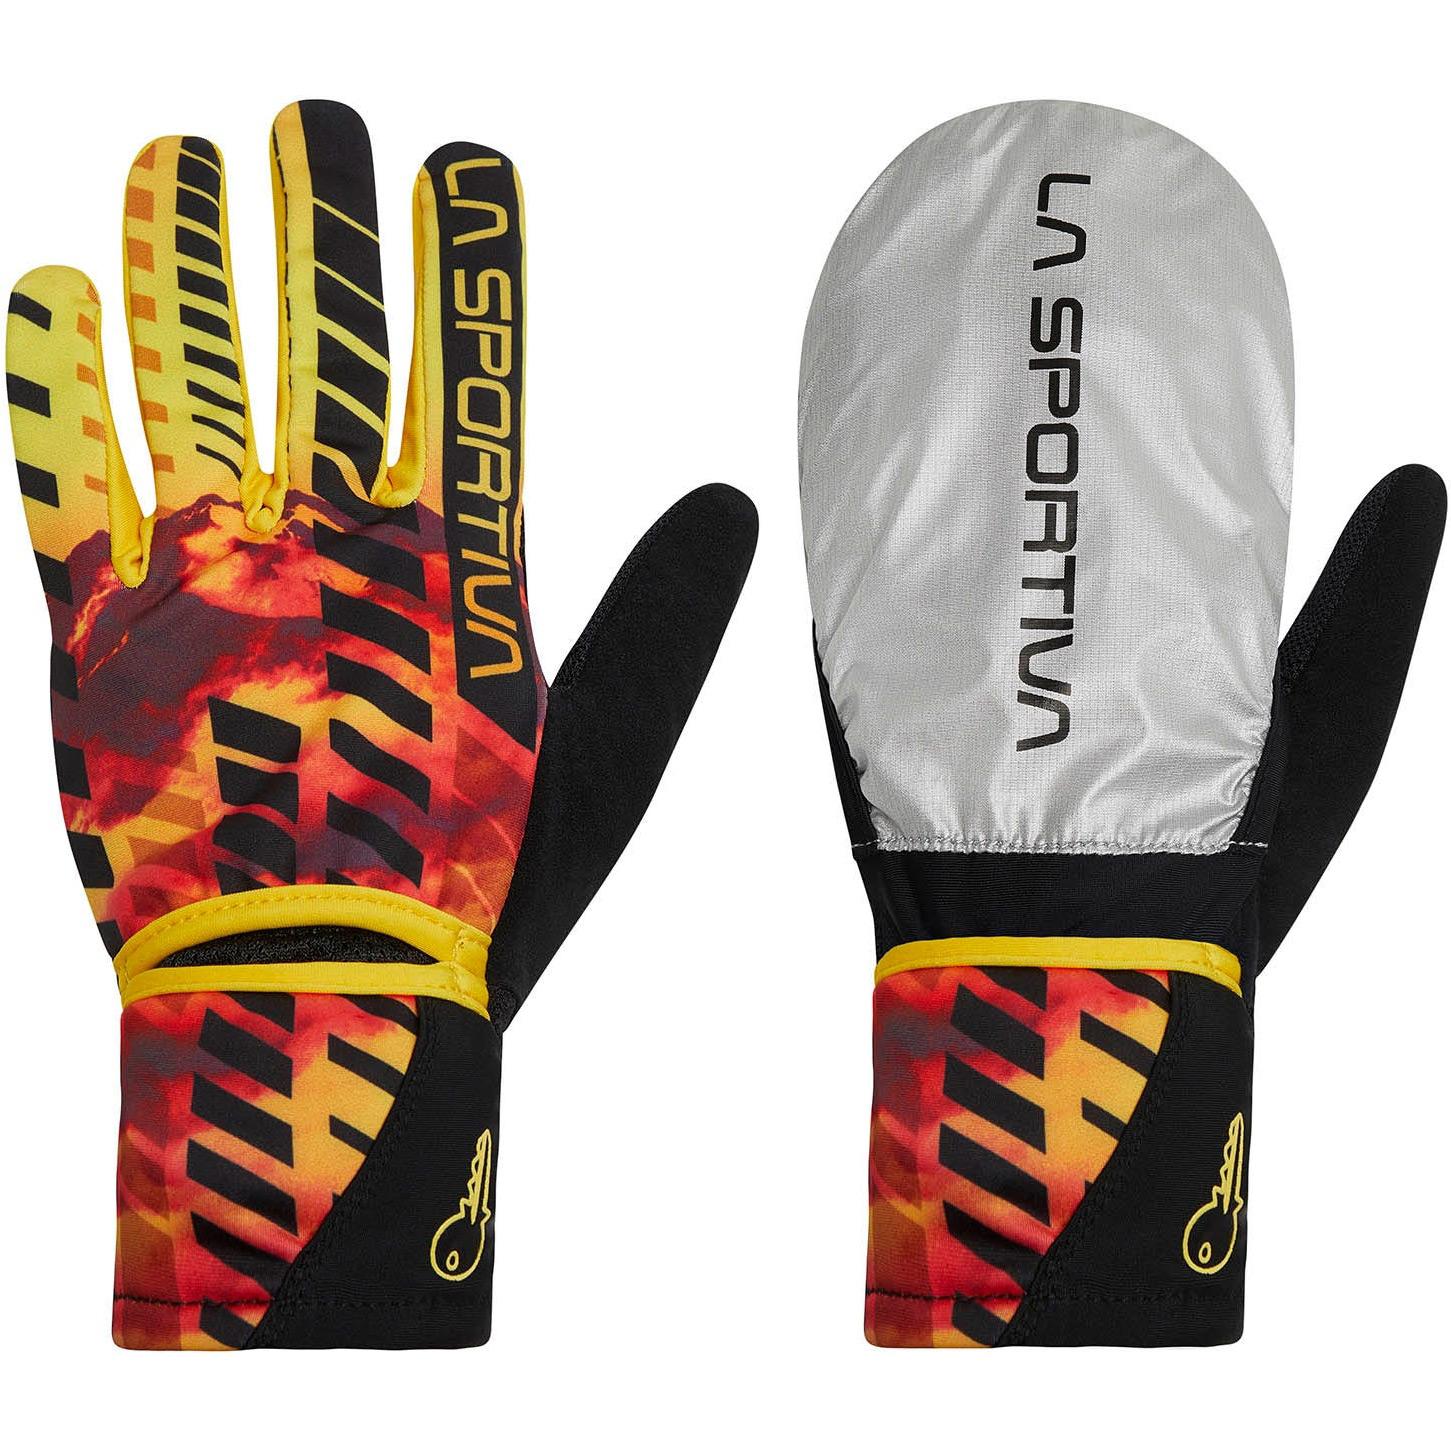 La Sportiva Trail Handschuhe - Gelb/Schwarz